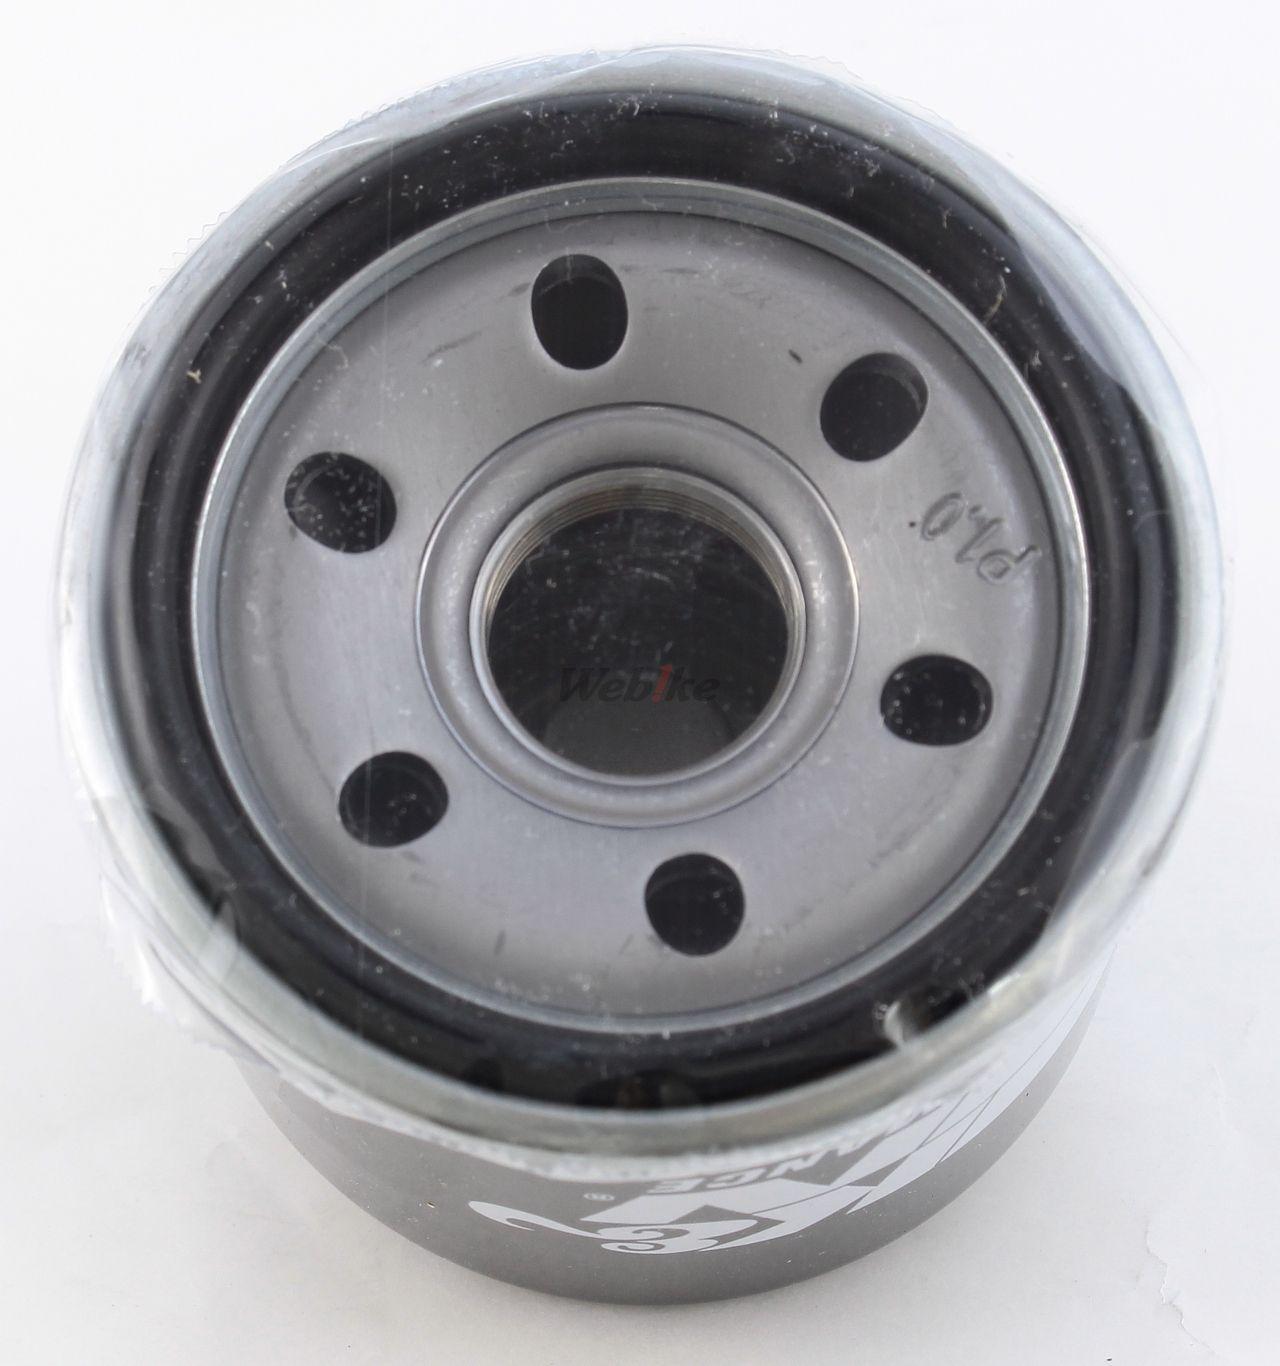 YOSHIMURA : K&N Oil Filter [KN-138]